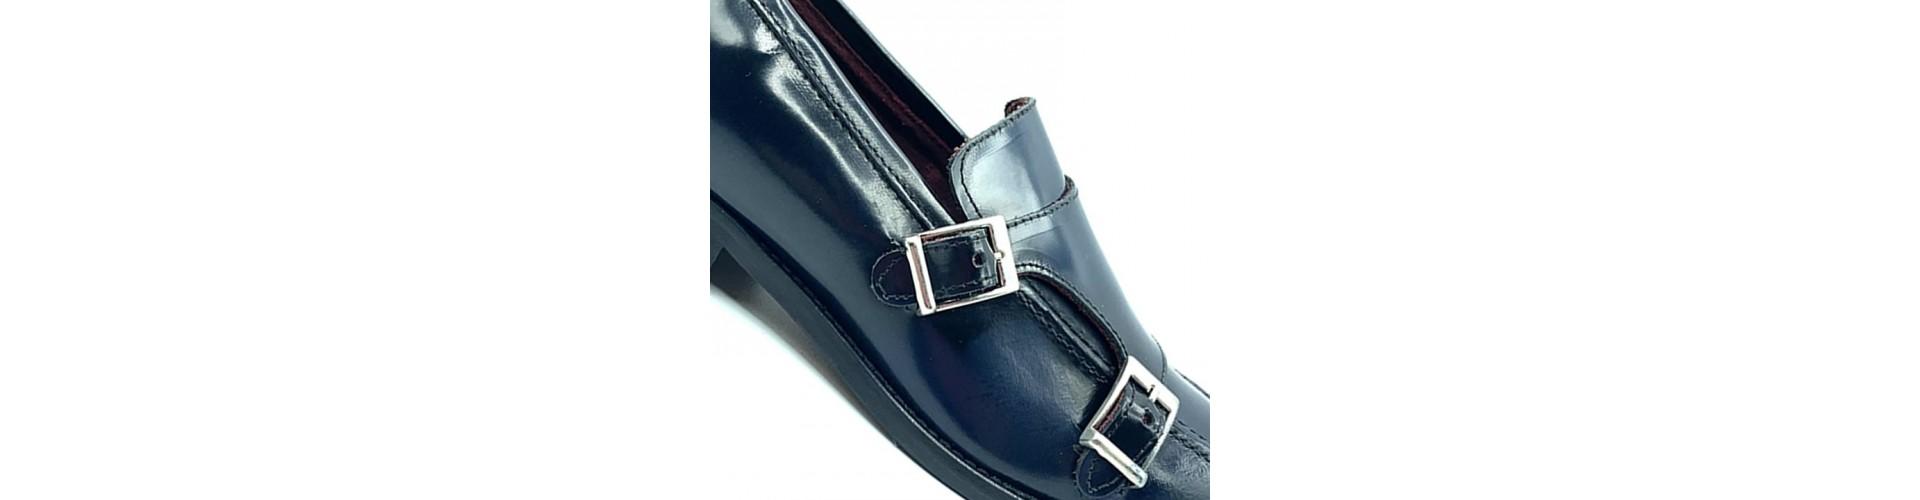 Zapatos doble hebilla para hombre